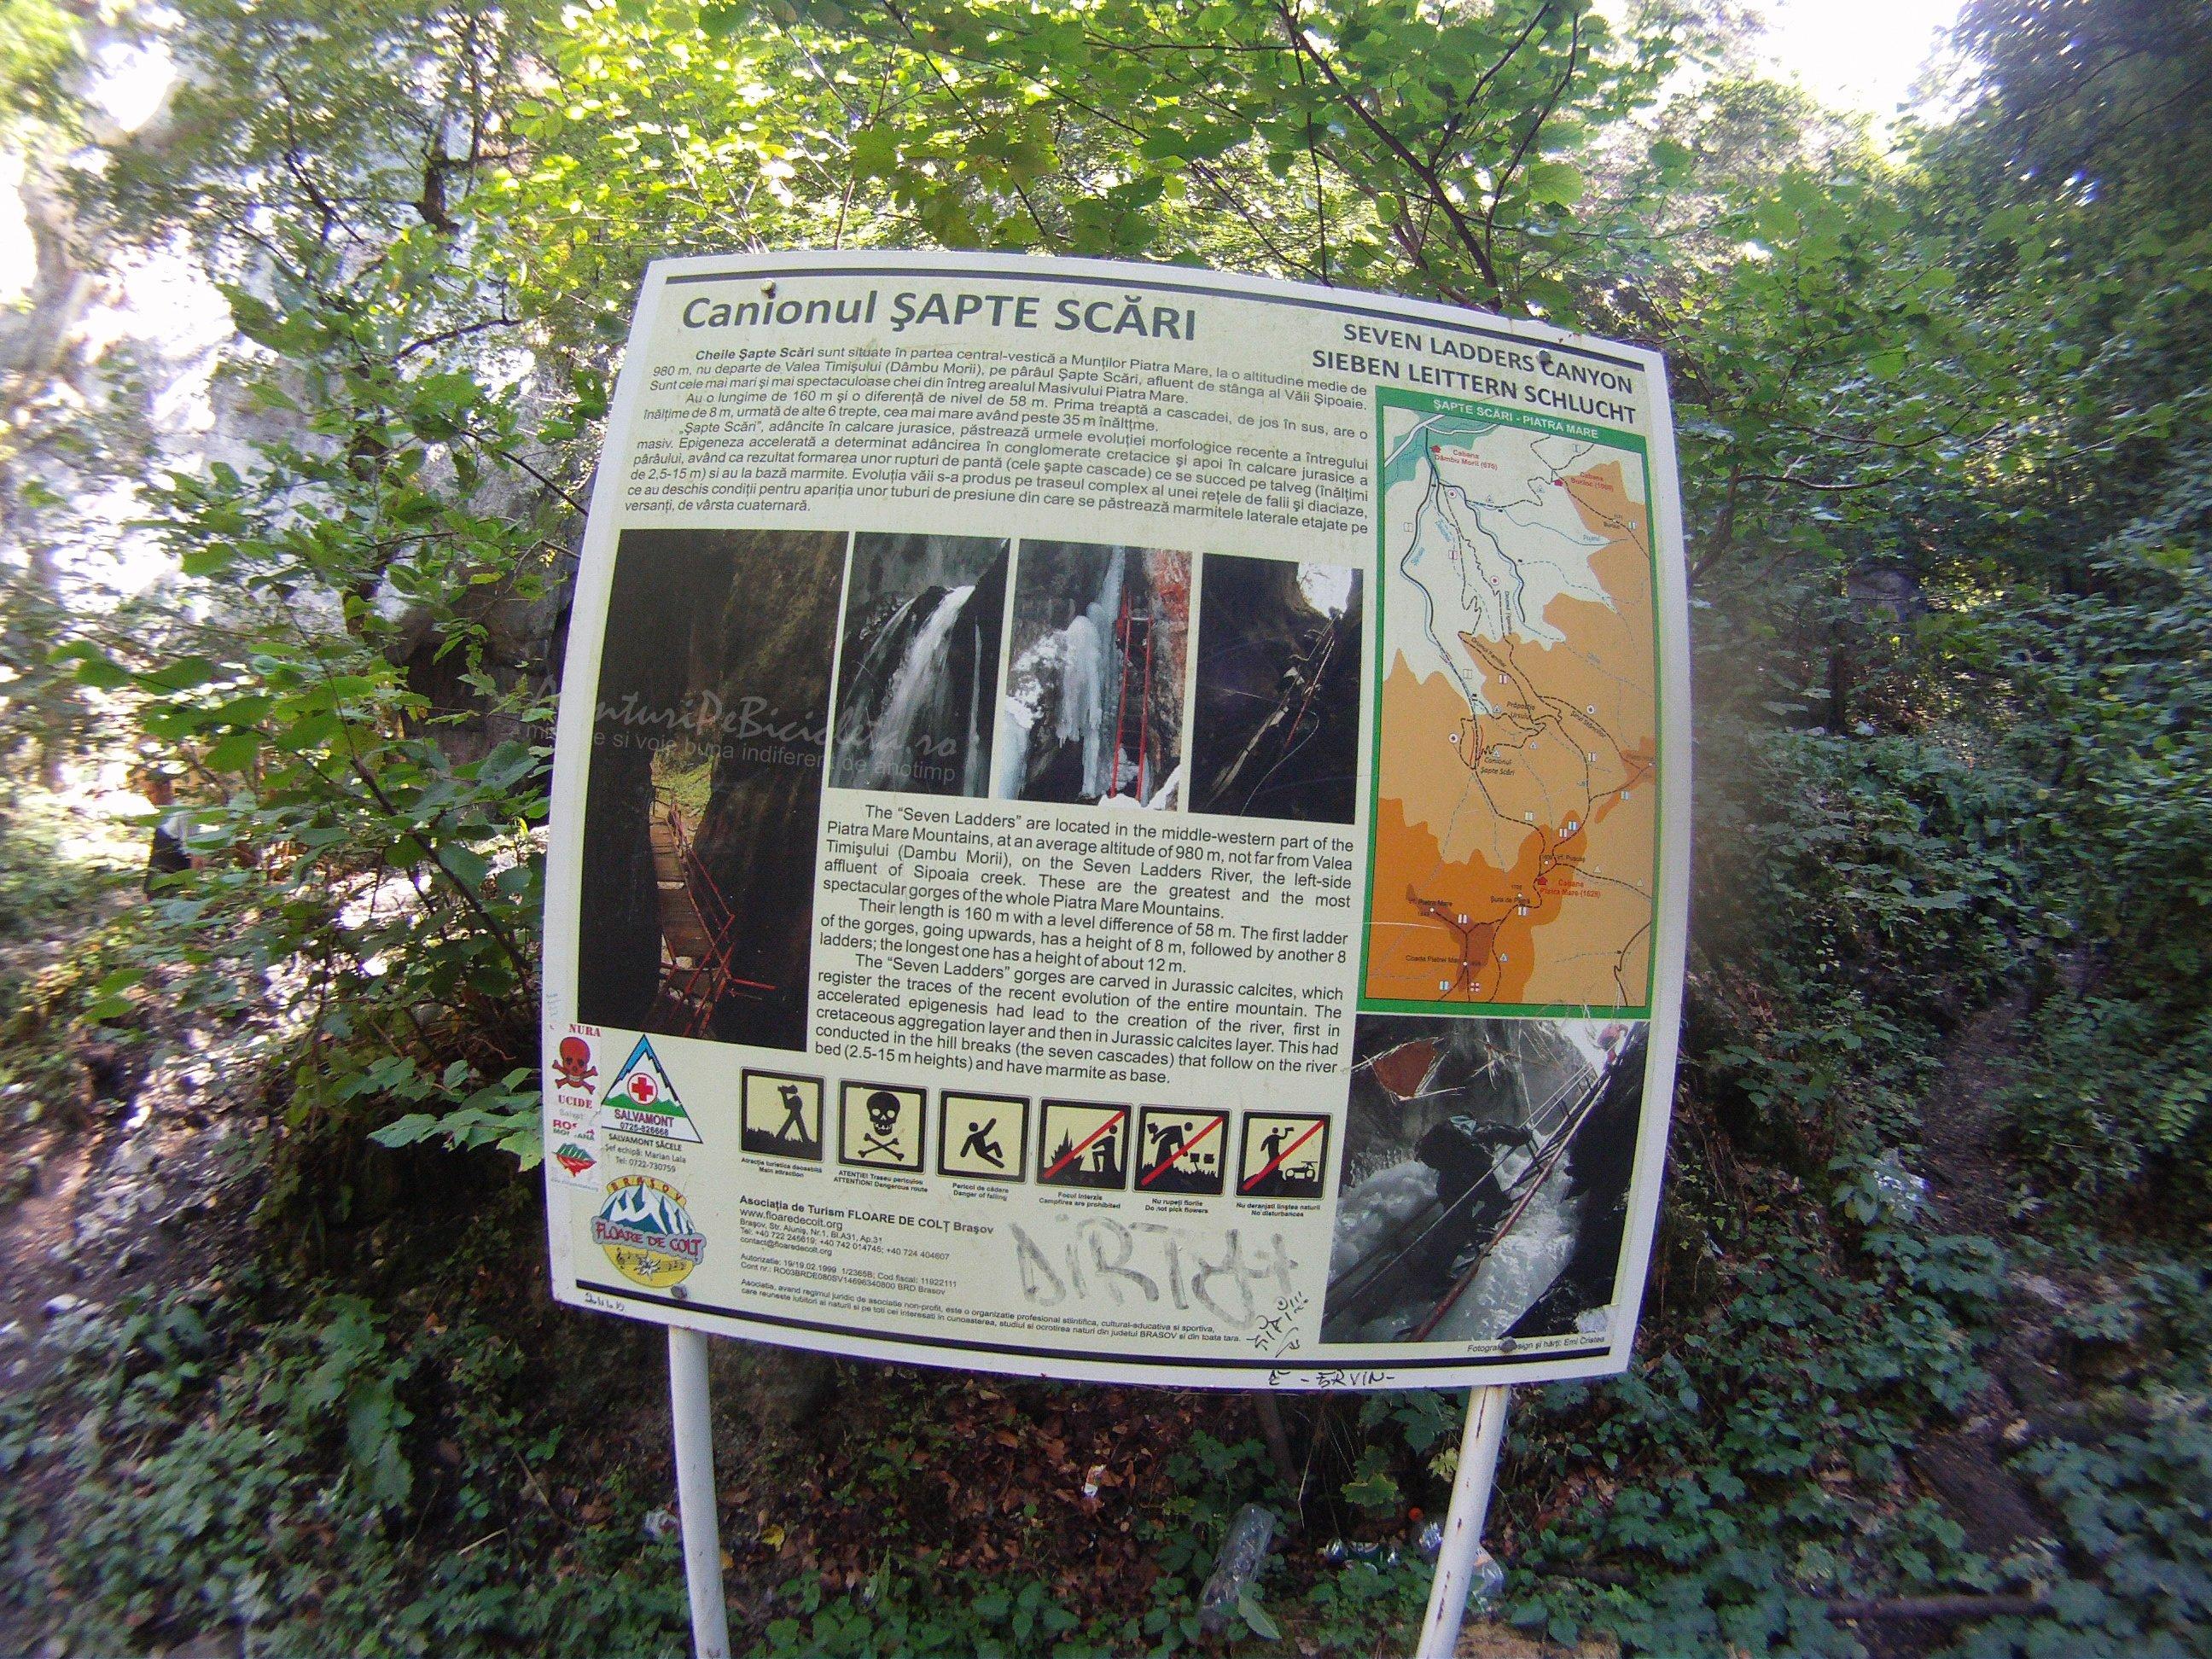 Aventuri pe bicicleta – Tura MARE – Traseul: Camping Darste – Canionul si Cascada Sapte Scari